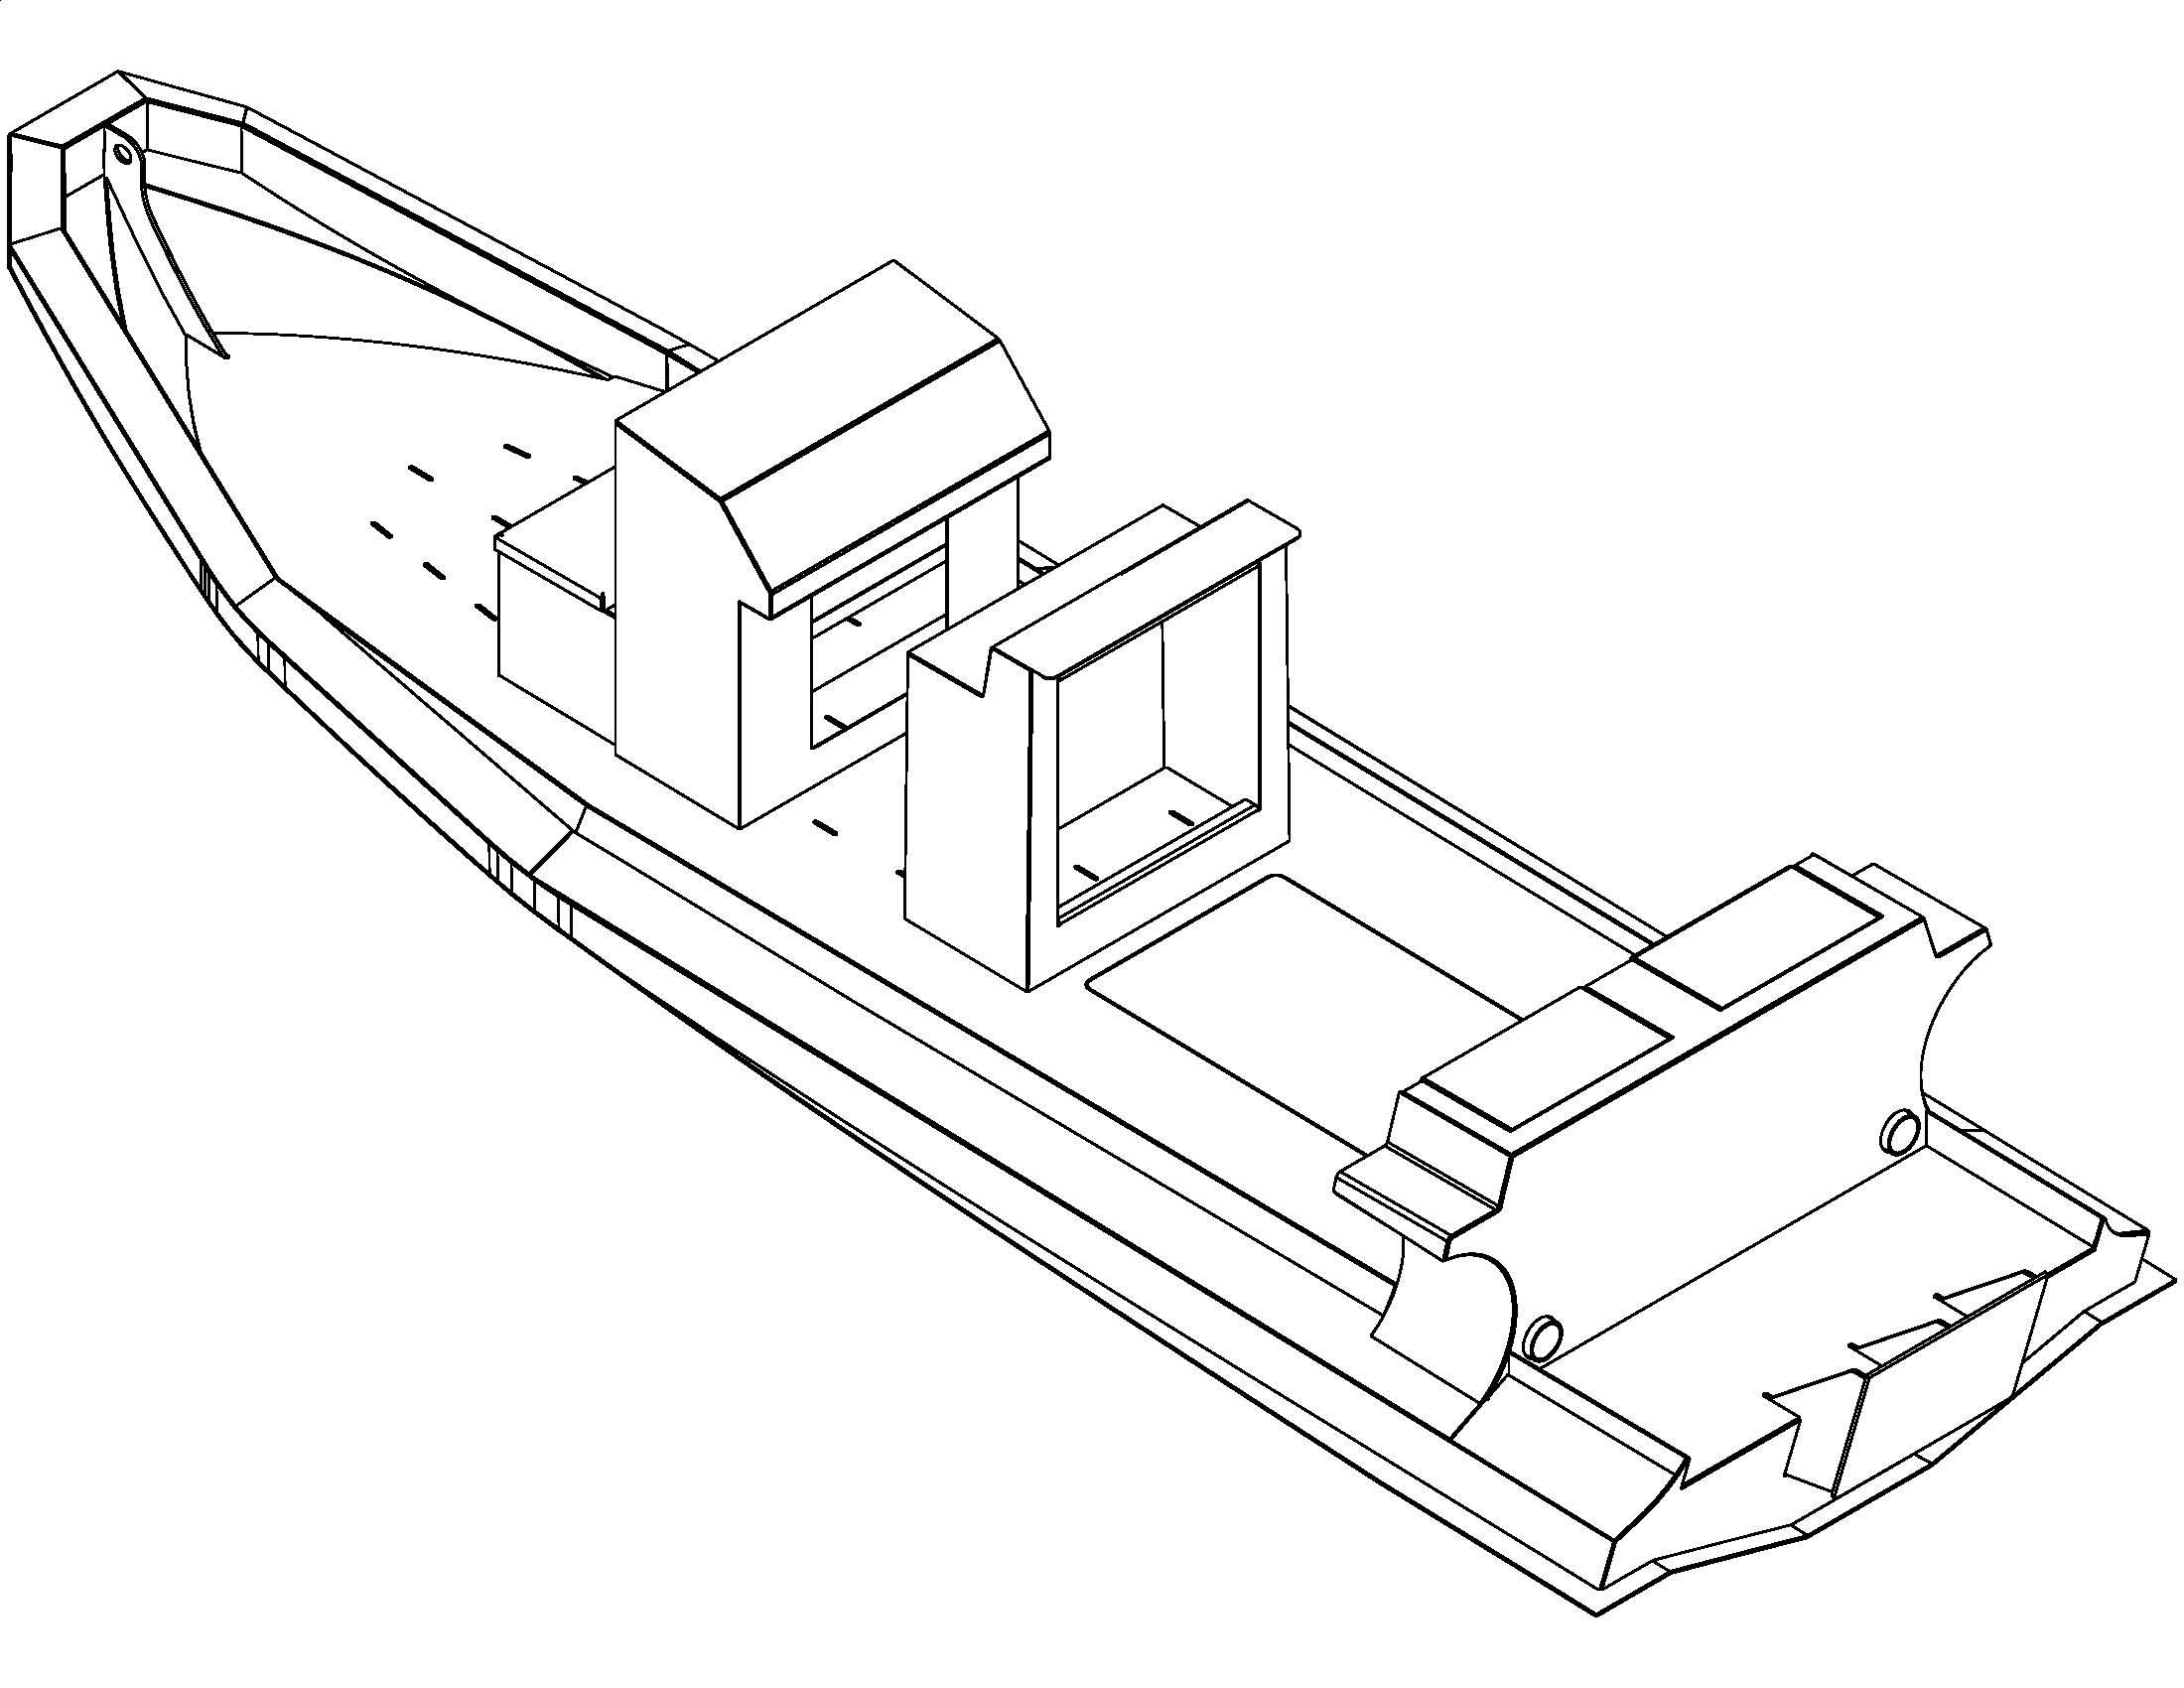 2200x1700 Aluminum Rib Boat Plans